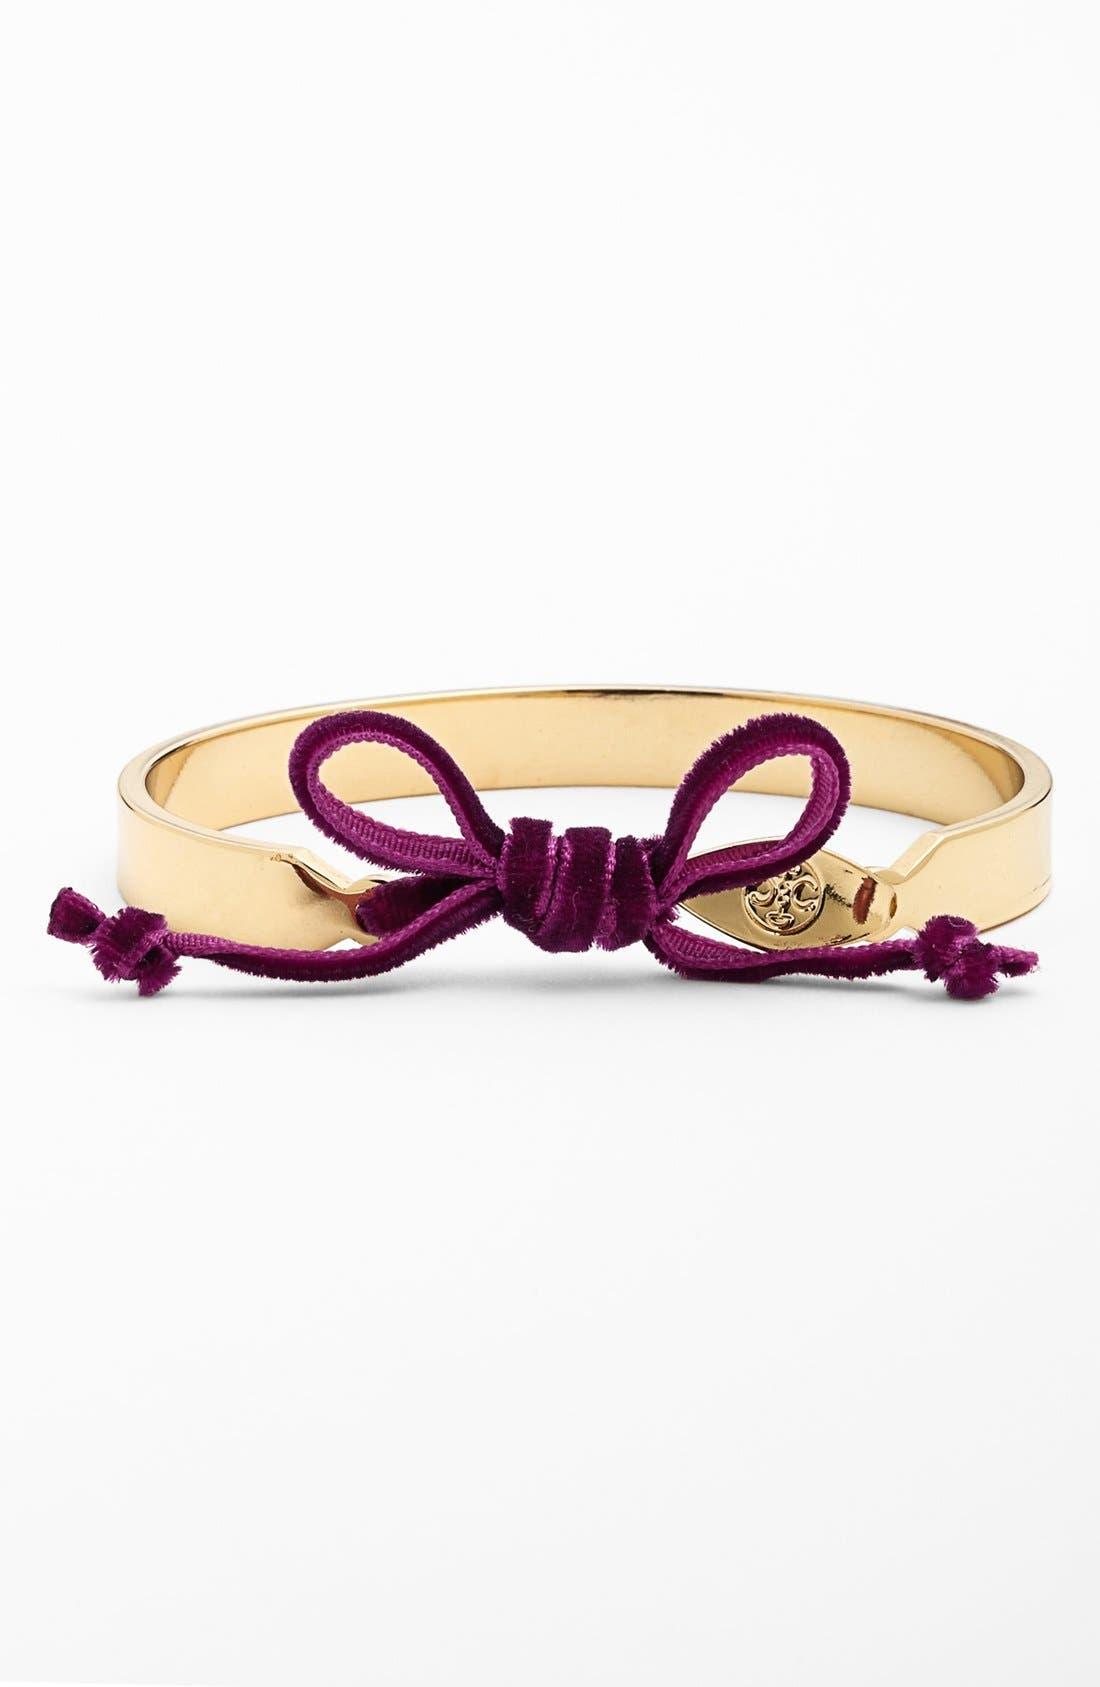 Alternate Image 1 Selected - Carbon Copy Tie Bracelet